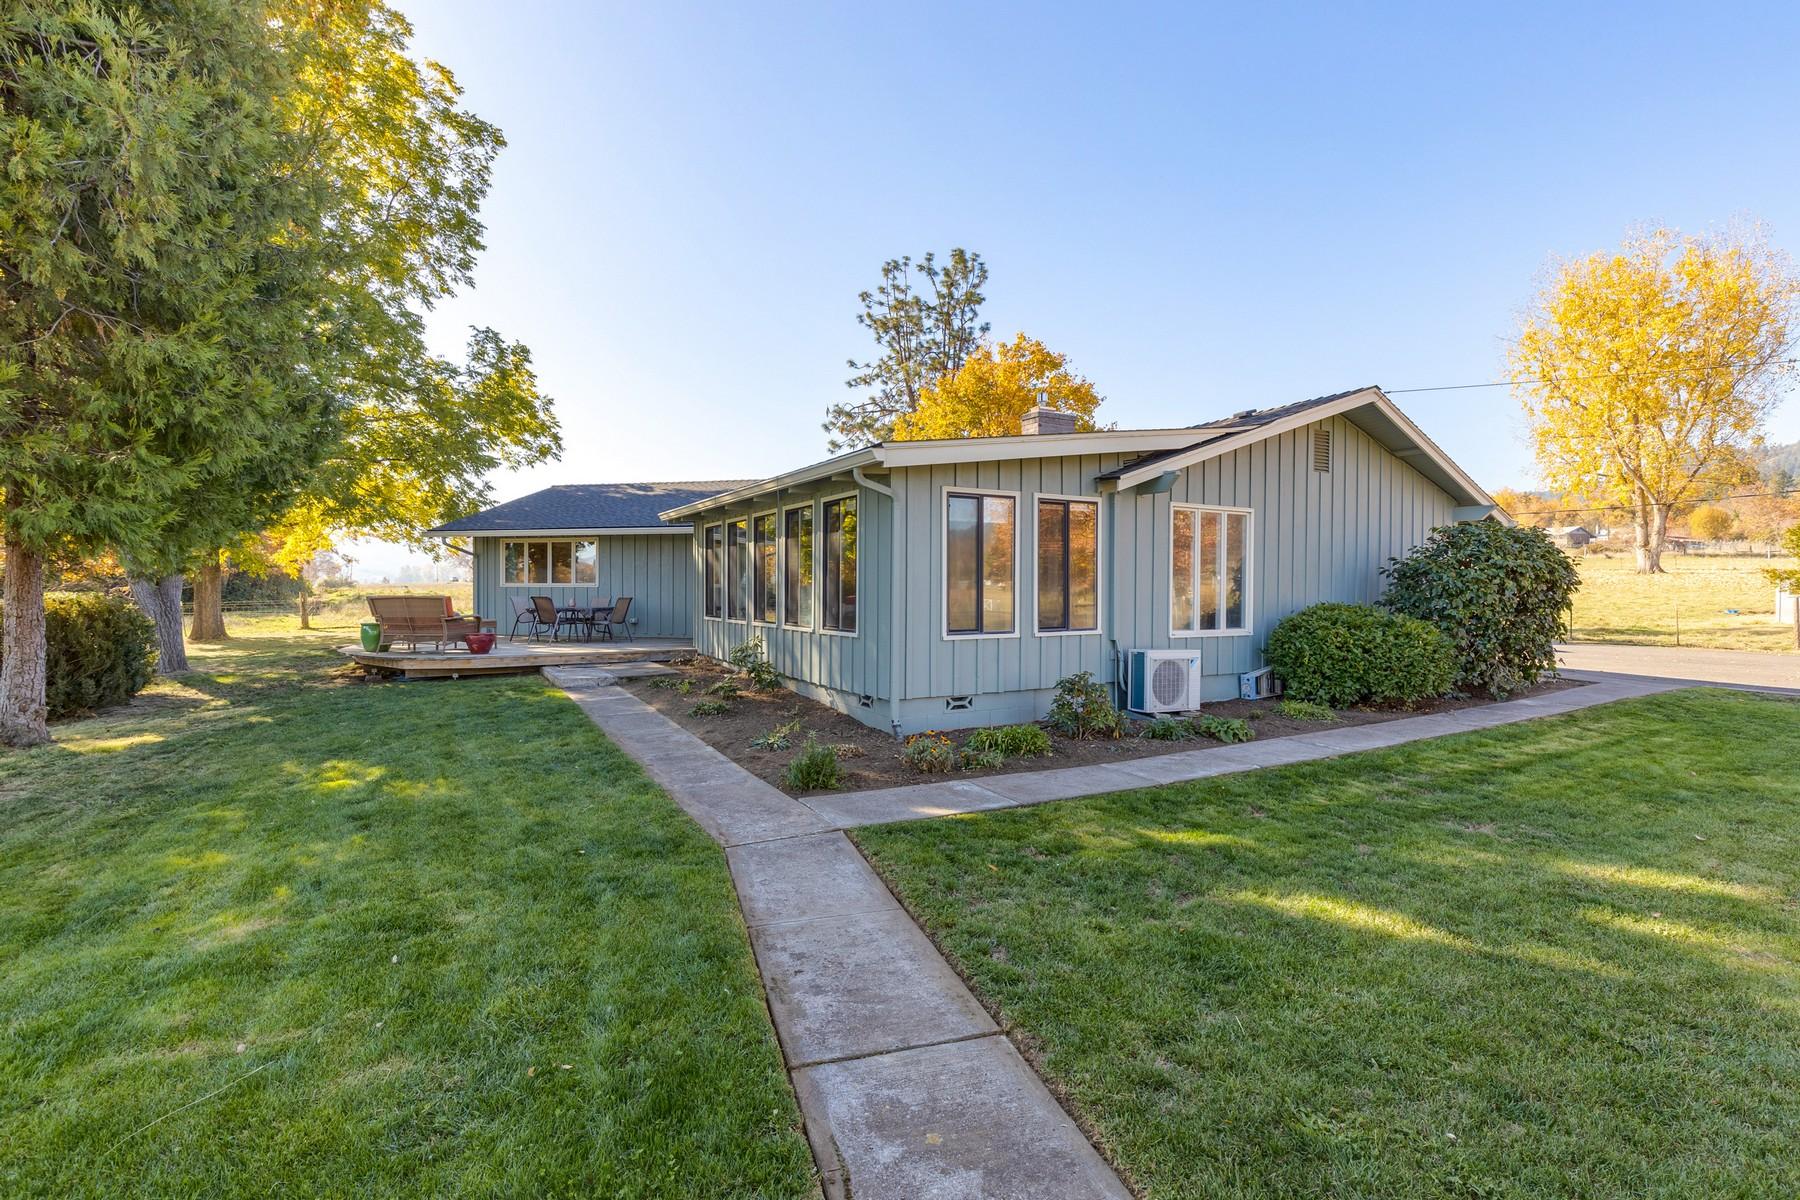 Single Family Homes pour l Vente à Country Setting Minutes to Town - Medford, OR 3195 Ross Lane, Medford, Oregon 97530 États-Unis